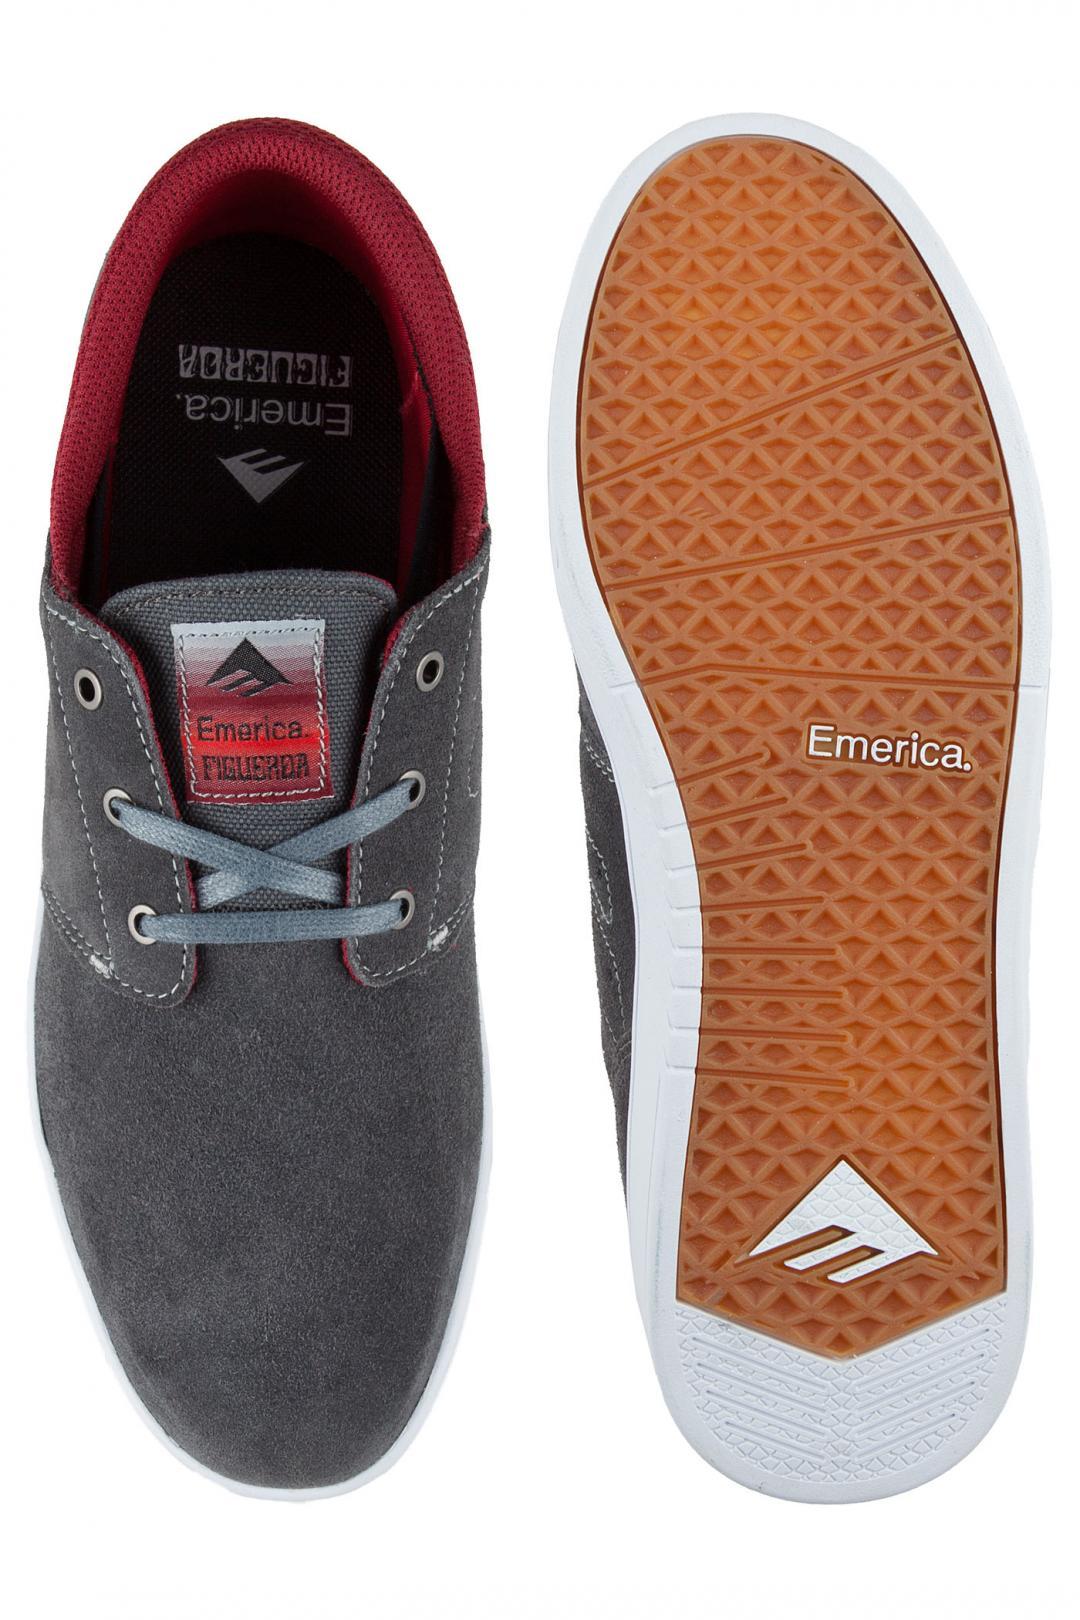 Uomo Emerica The Figueroa grey burgundy   Sneaker